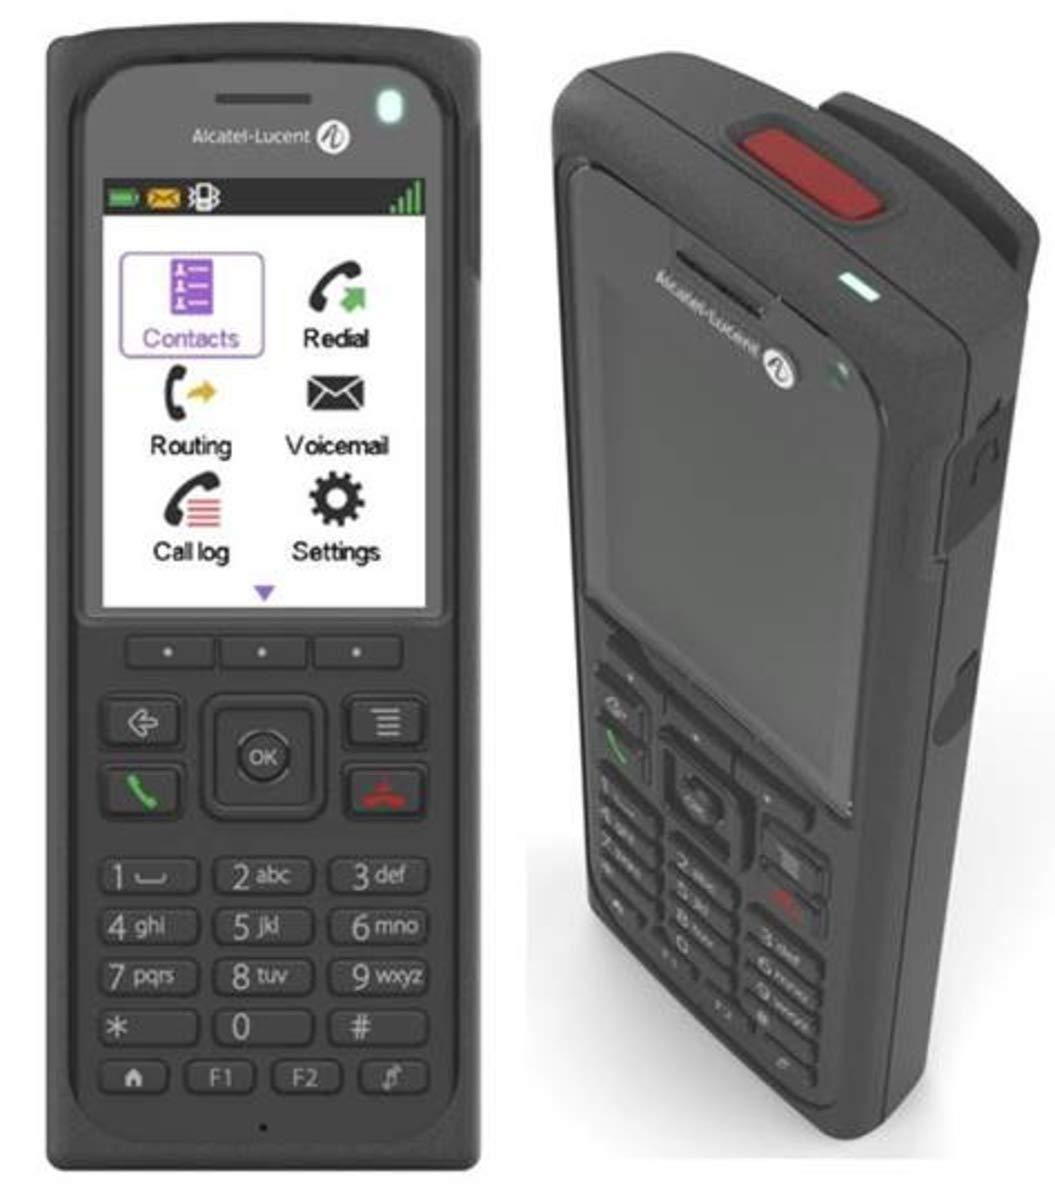 Alcatel-Lucent Dect 8262 - Comprar Teléfonos Inalámbricos PABX baratos: Amazon.es: Electrónica